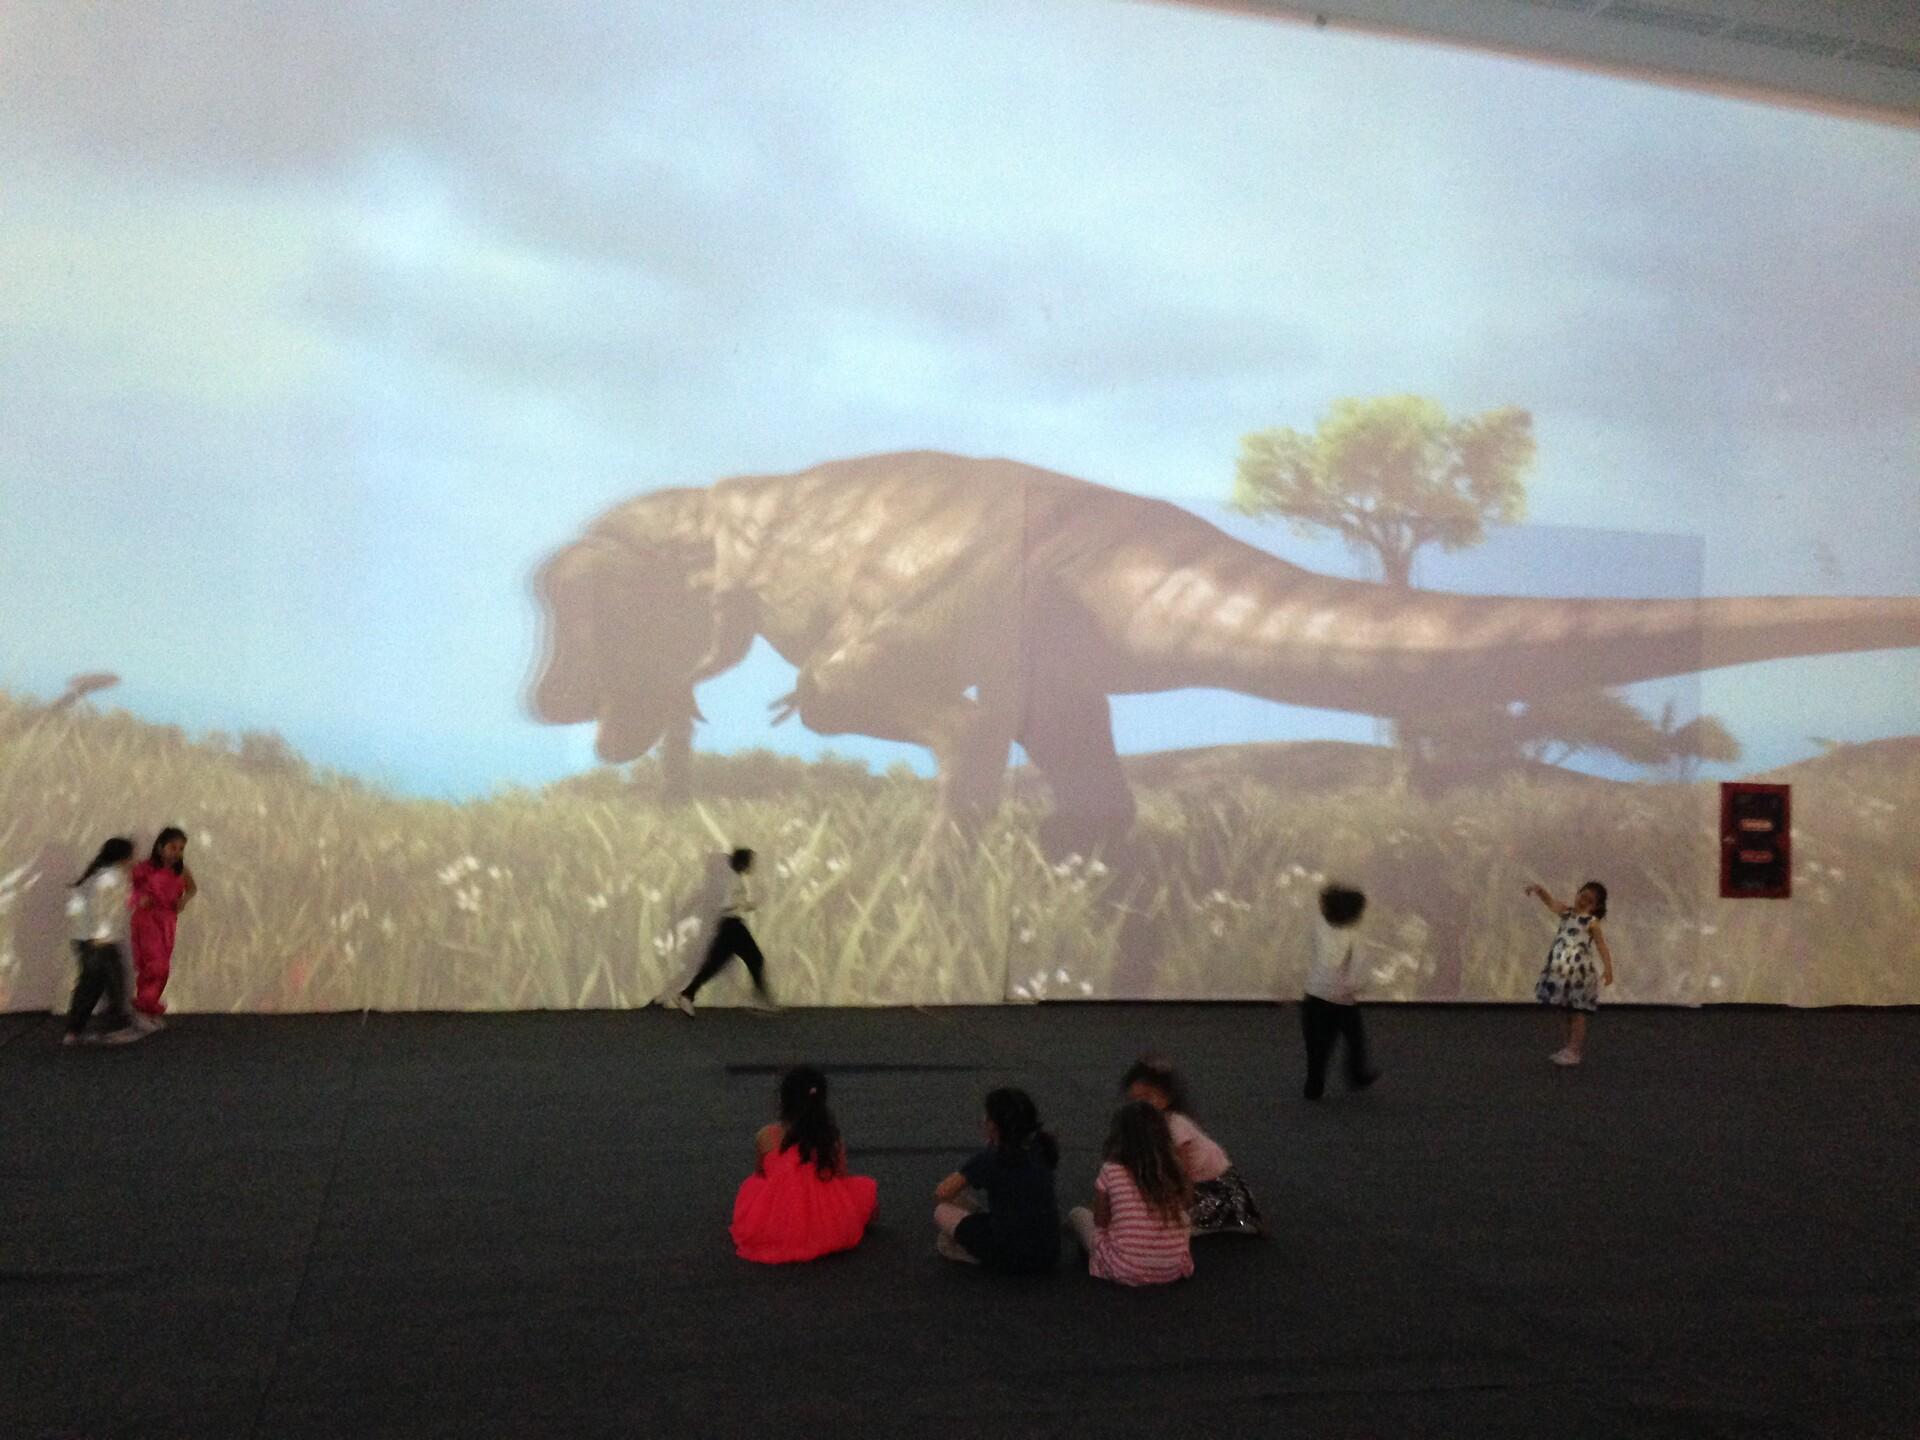 Dinosors in giant screen